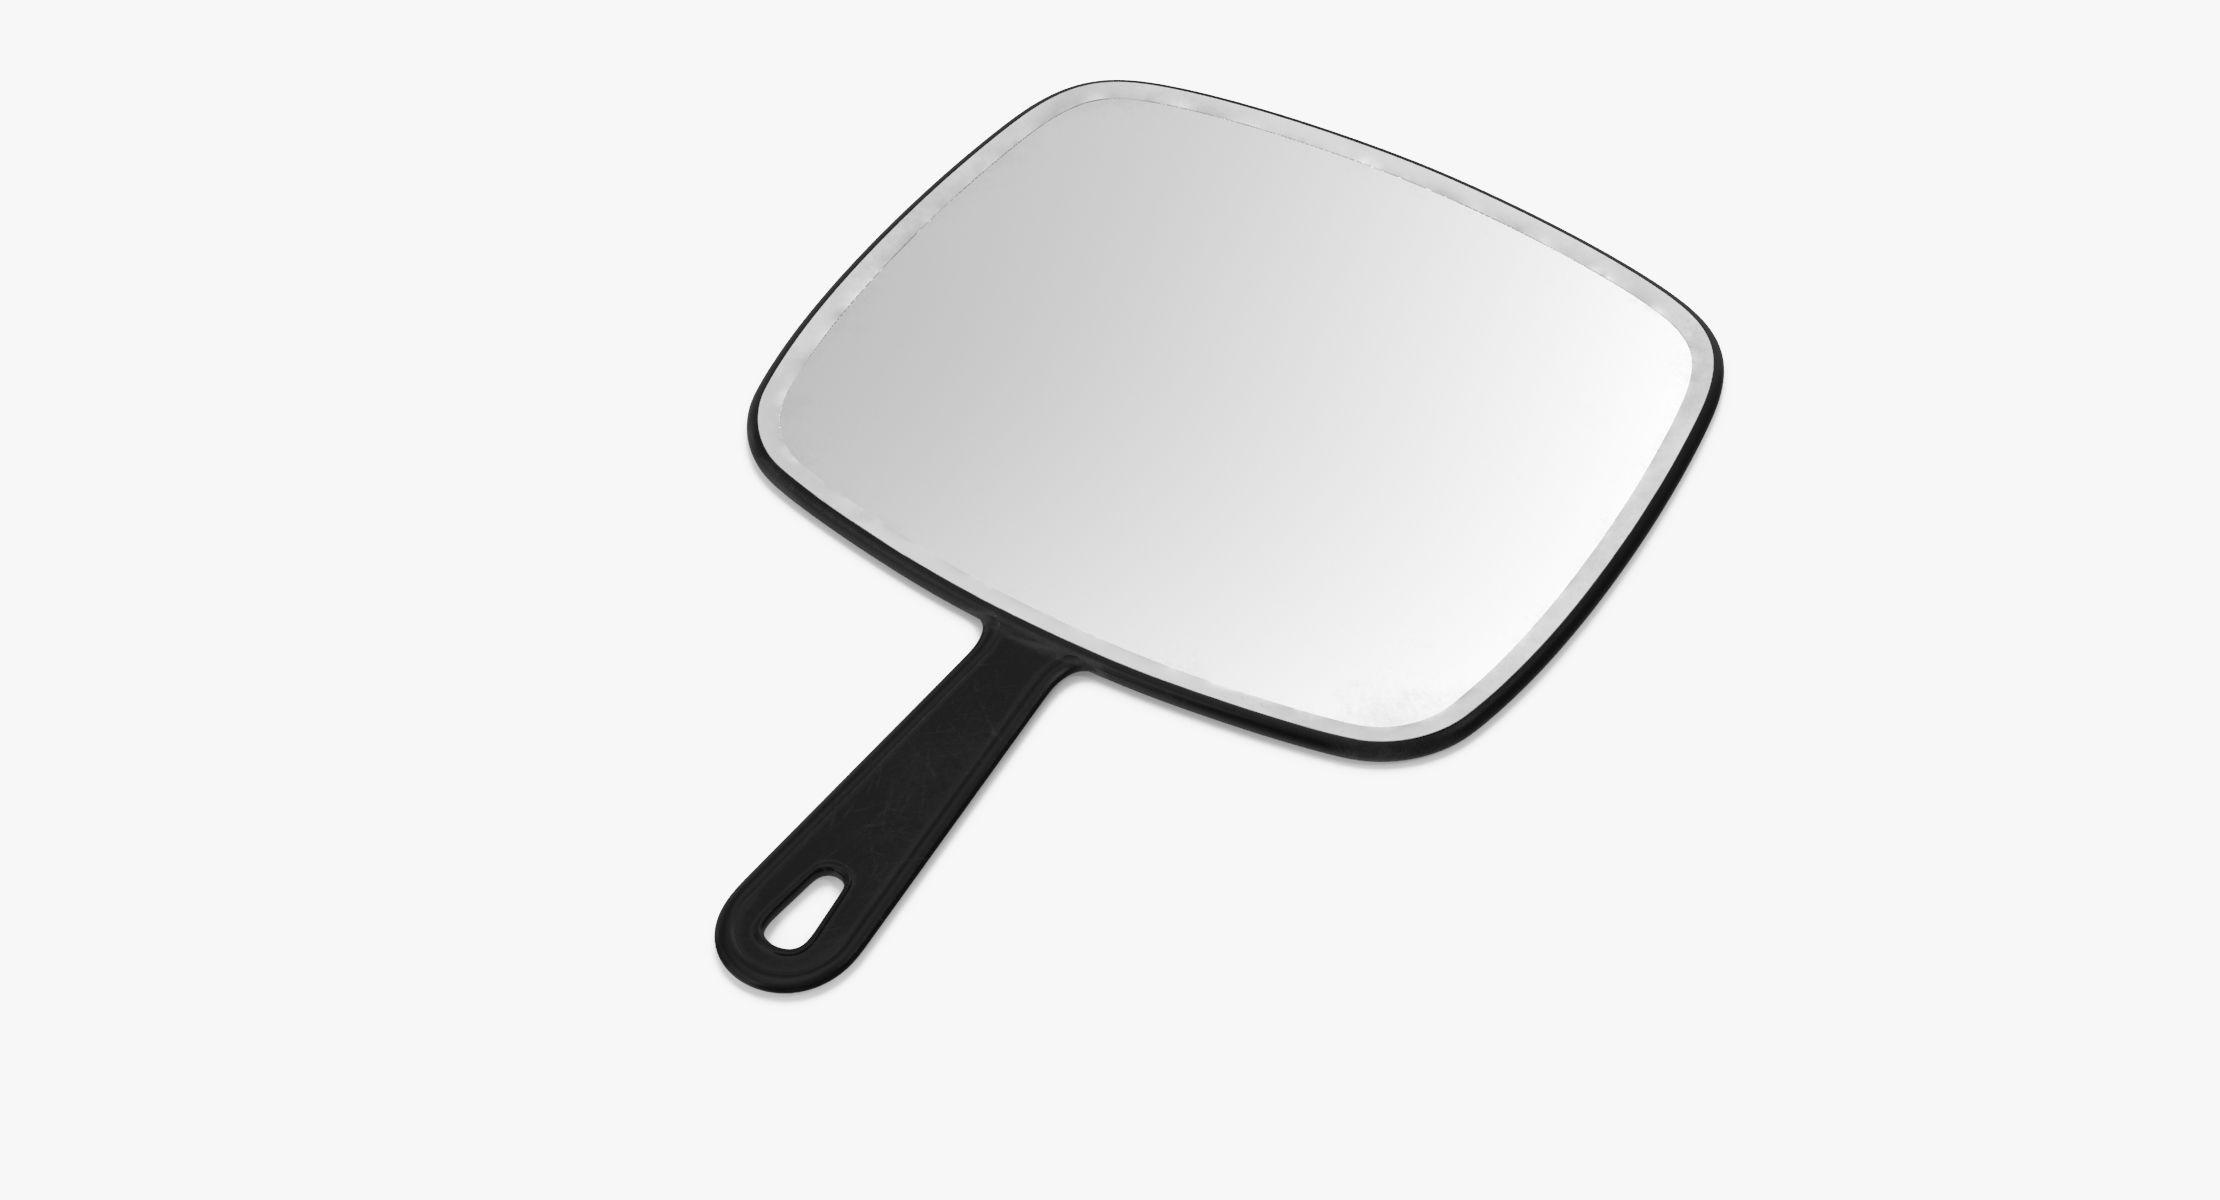 Hand Mirror 01 - reel 1